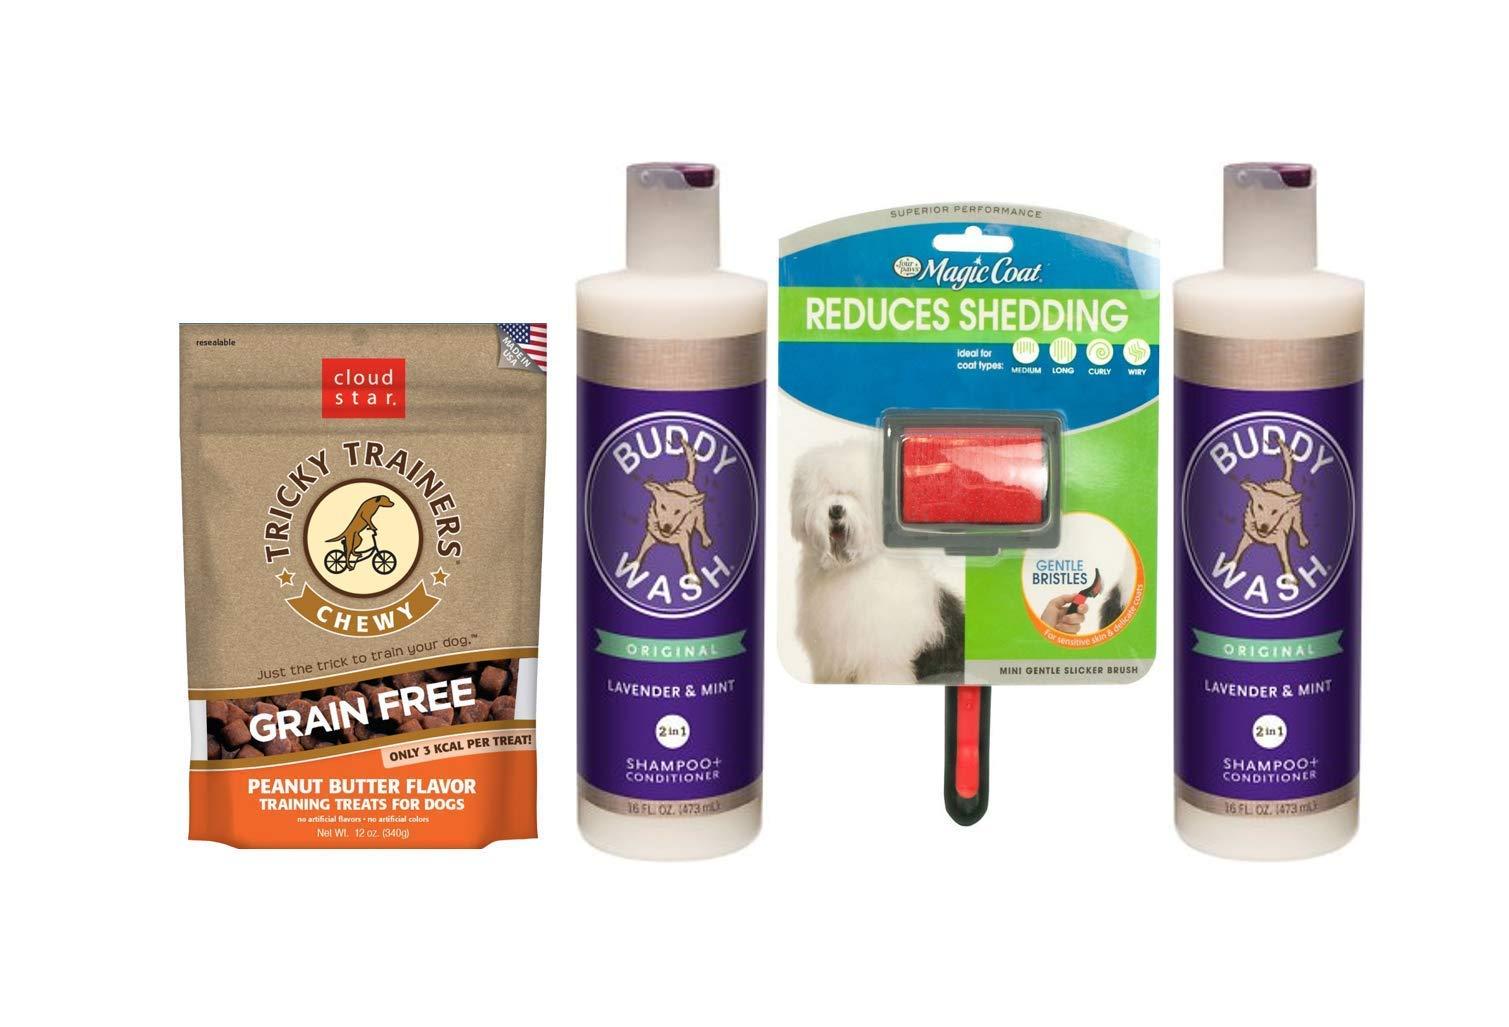 Cloud Star Buddy Wash Dog-Shampoo & Conditioner Lavender Mint 2 Bottles 1 Dog Brush 1 Bag Dog Treat